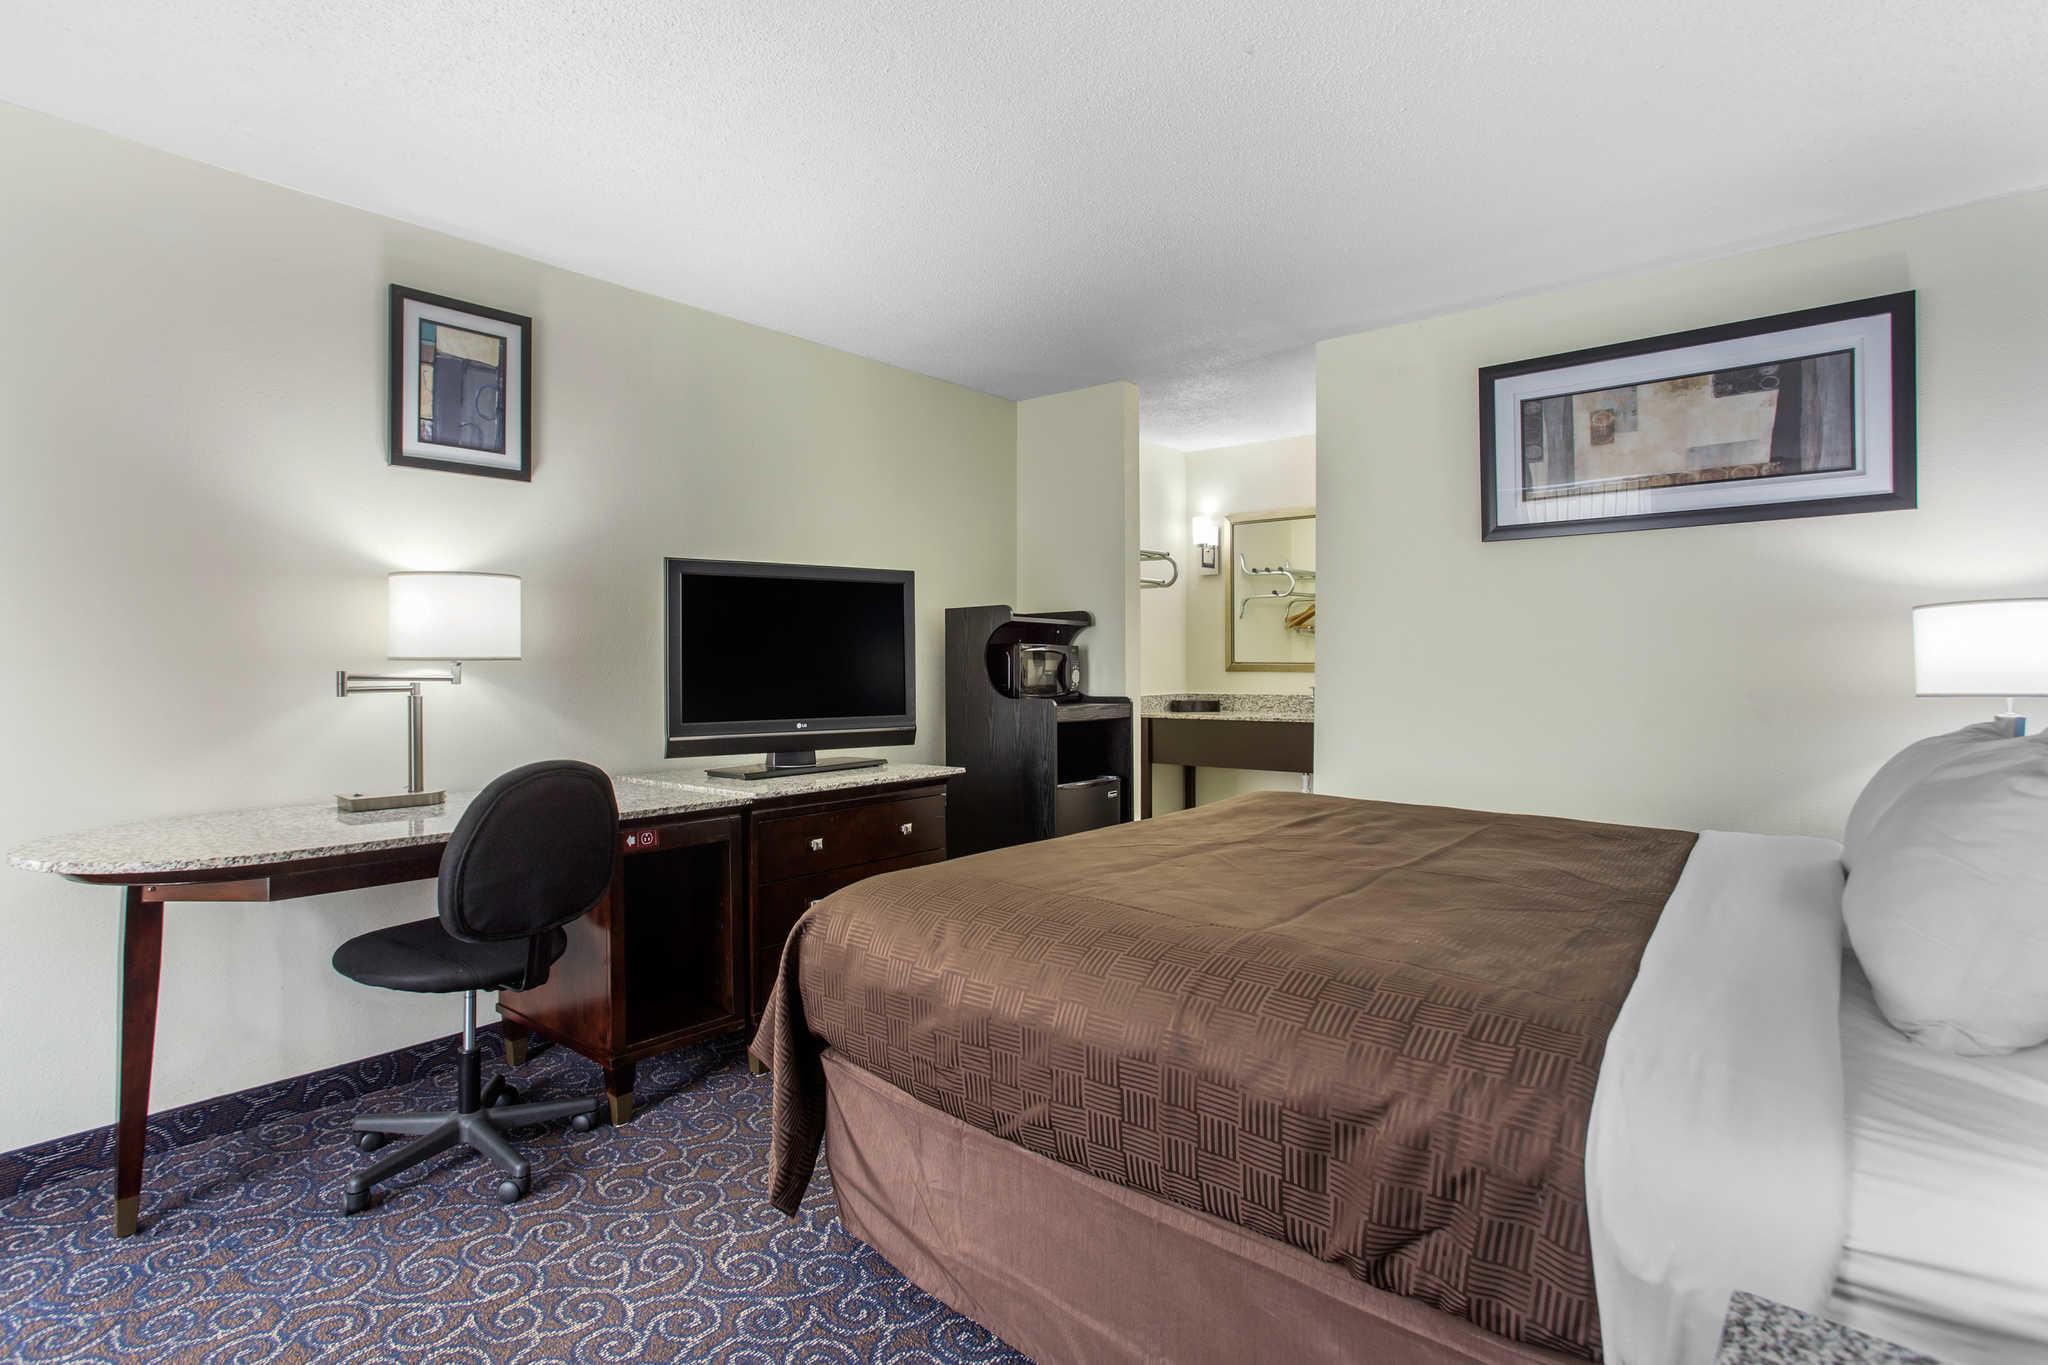 Clarion Inn & Suites image 15